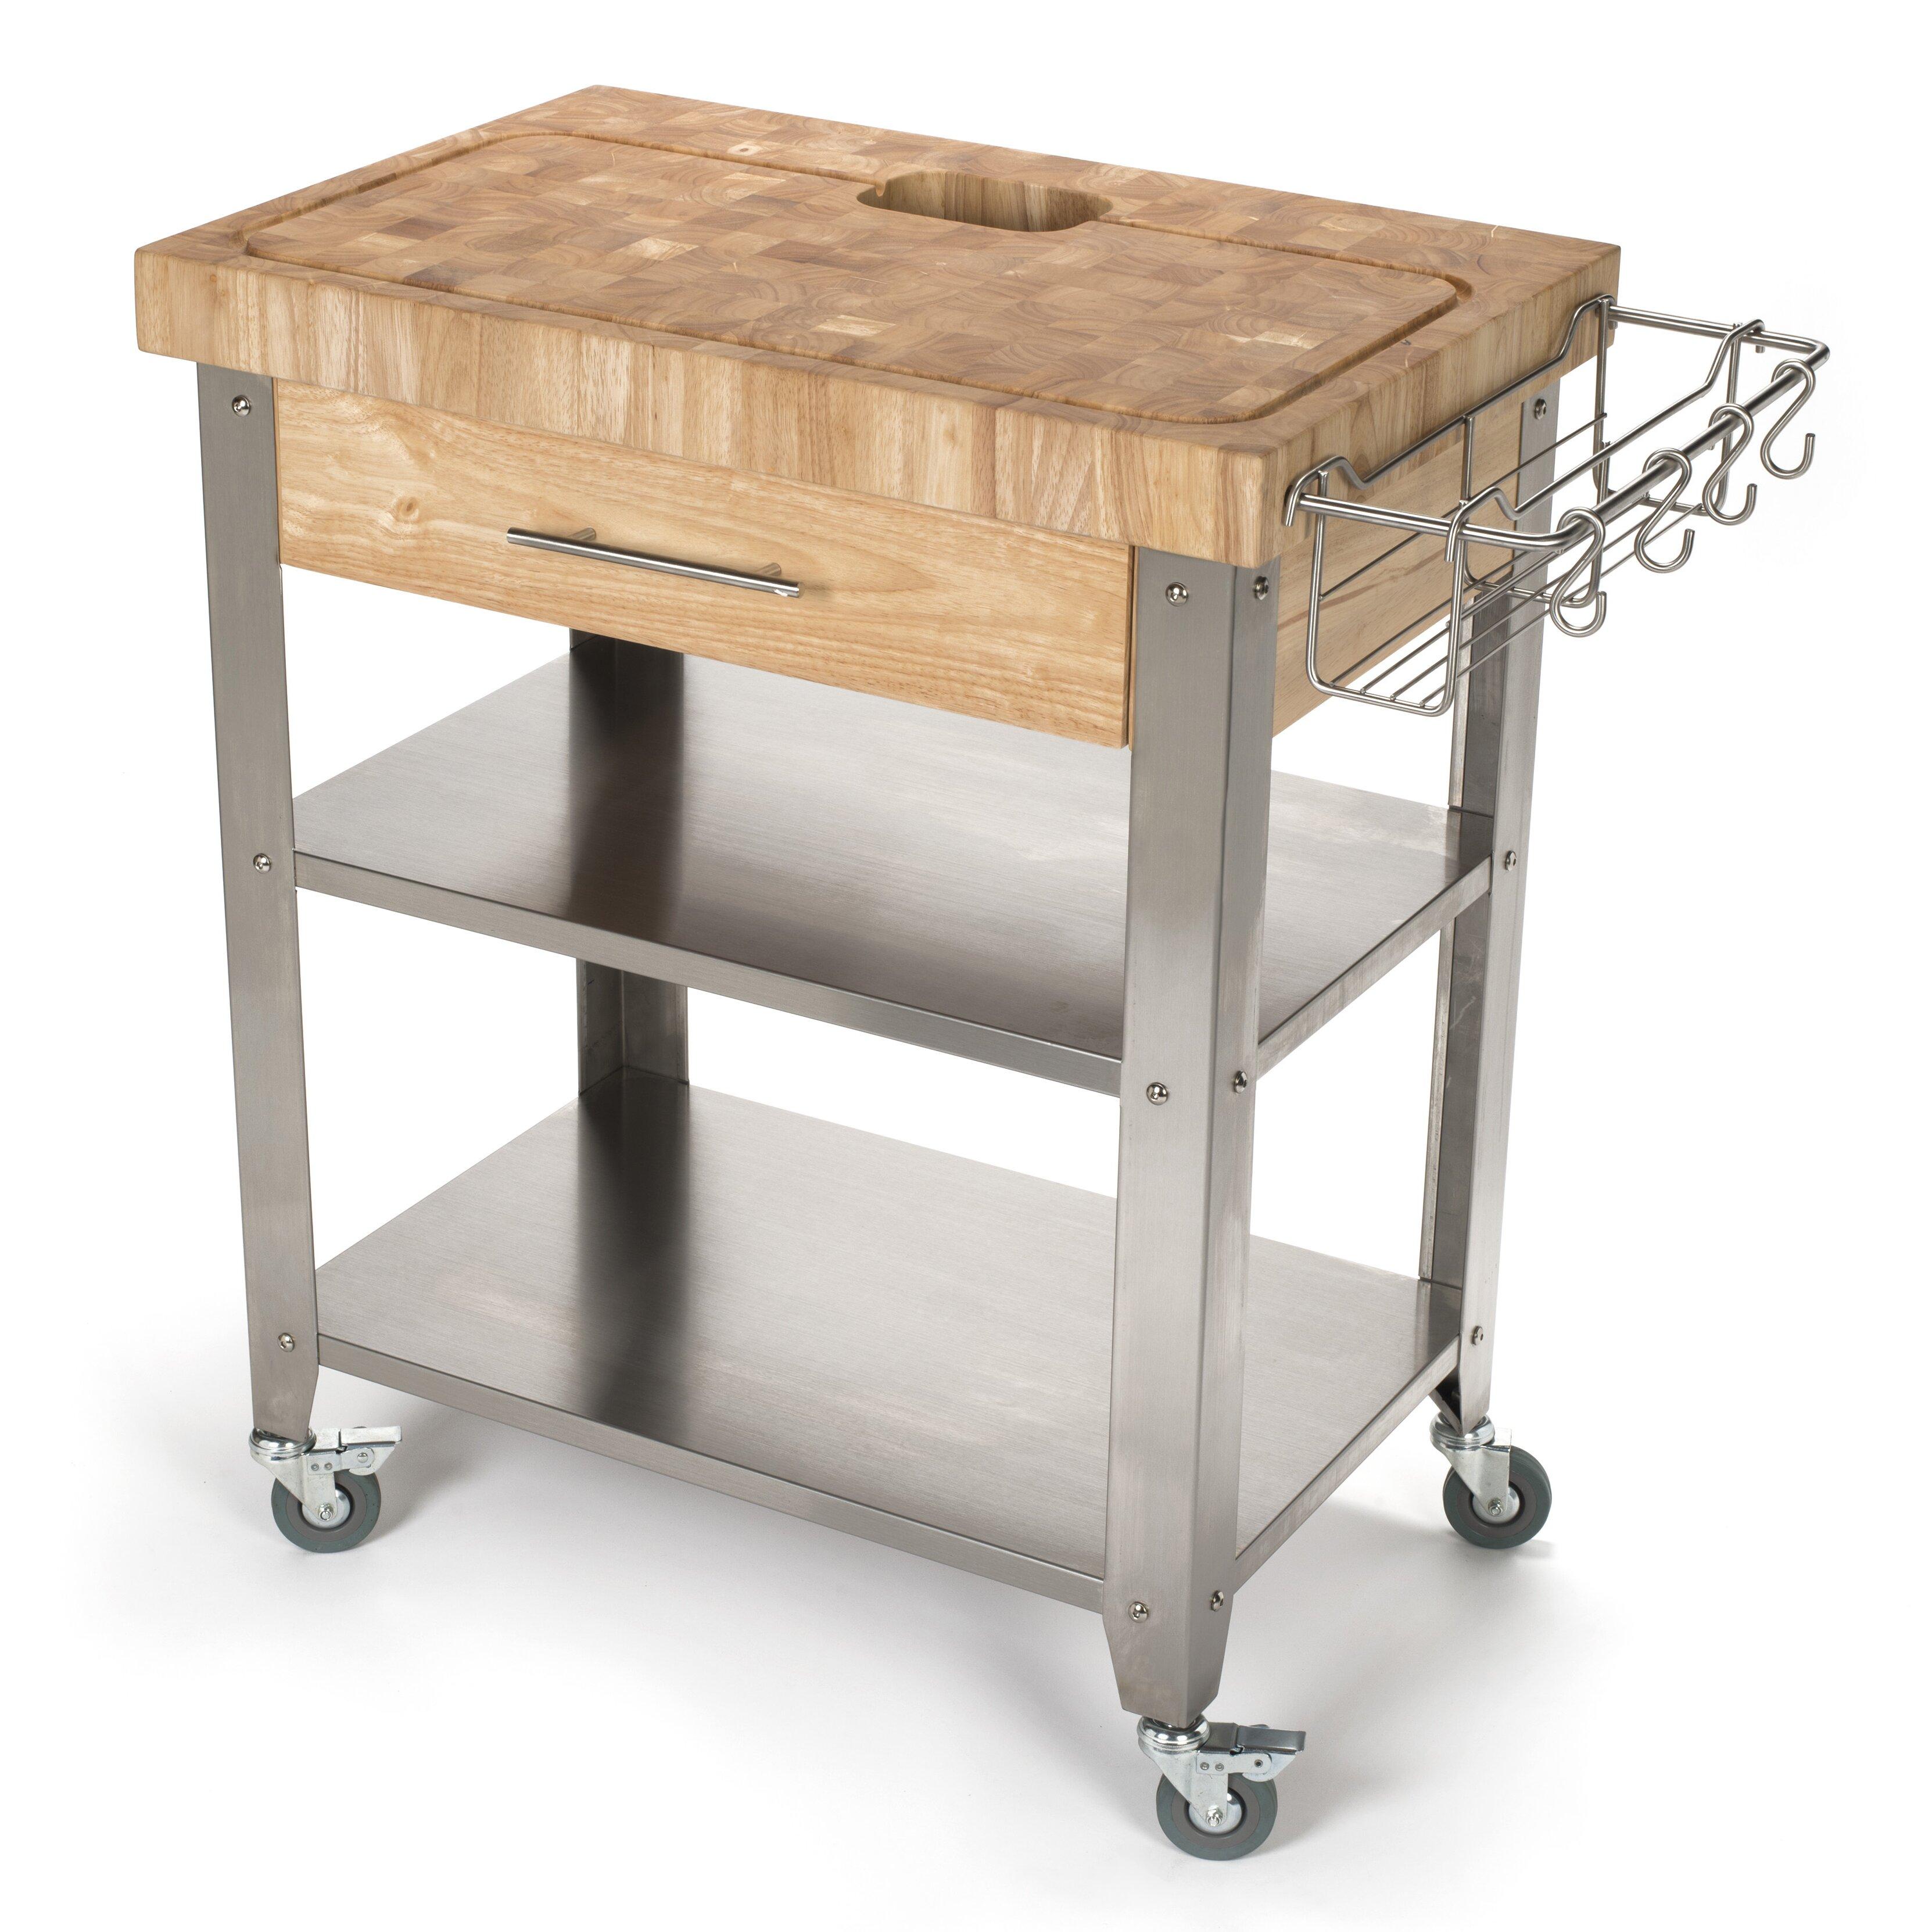 Chris & Chris Pro Stadium Kitchen Cart with Butcher Block